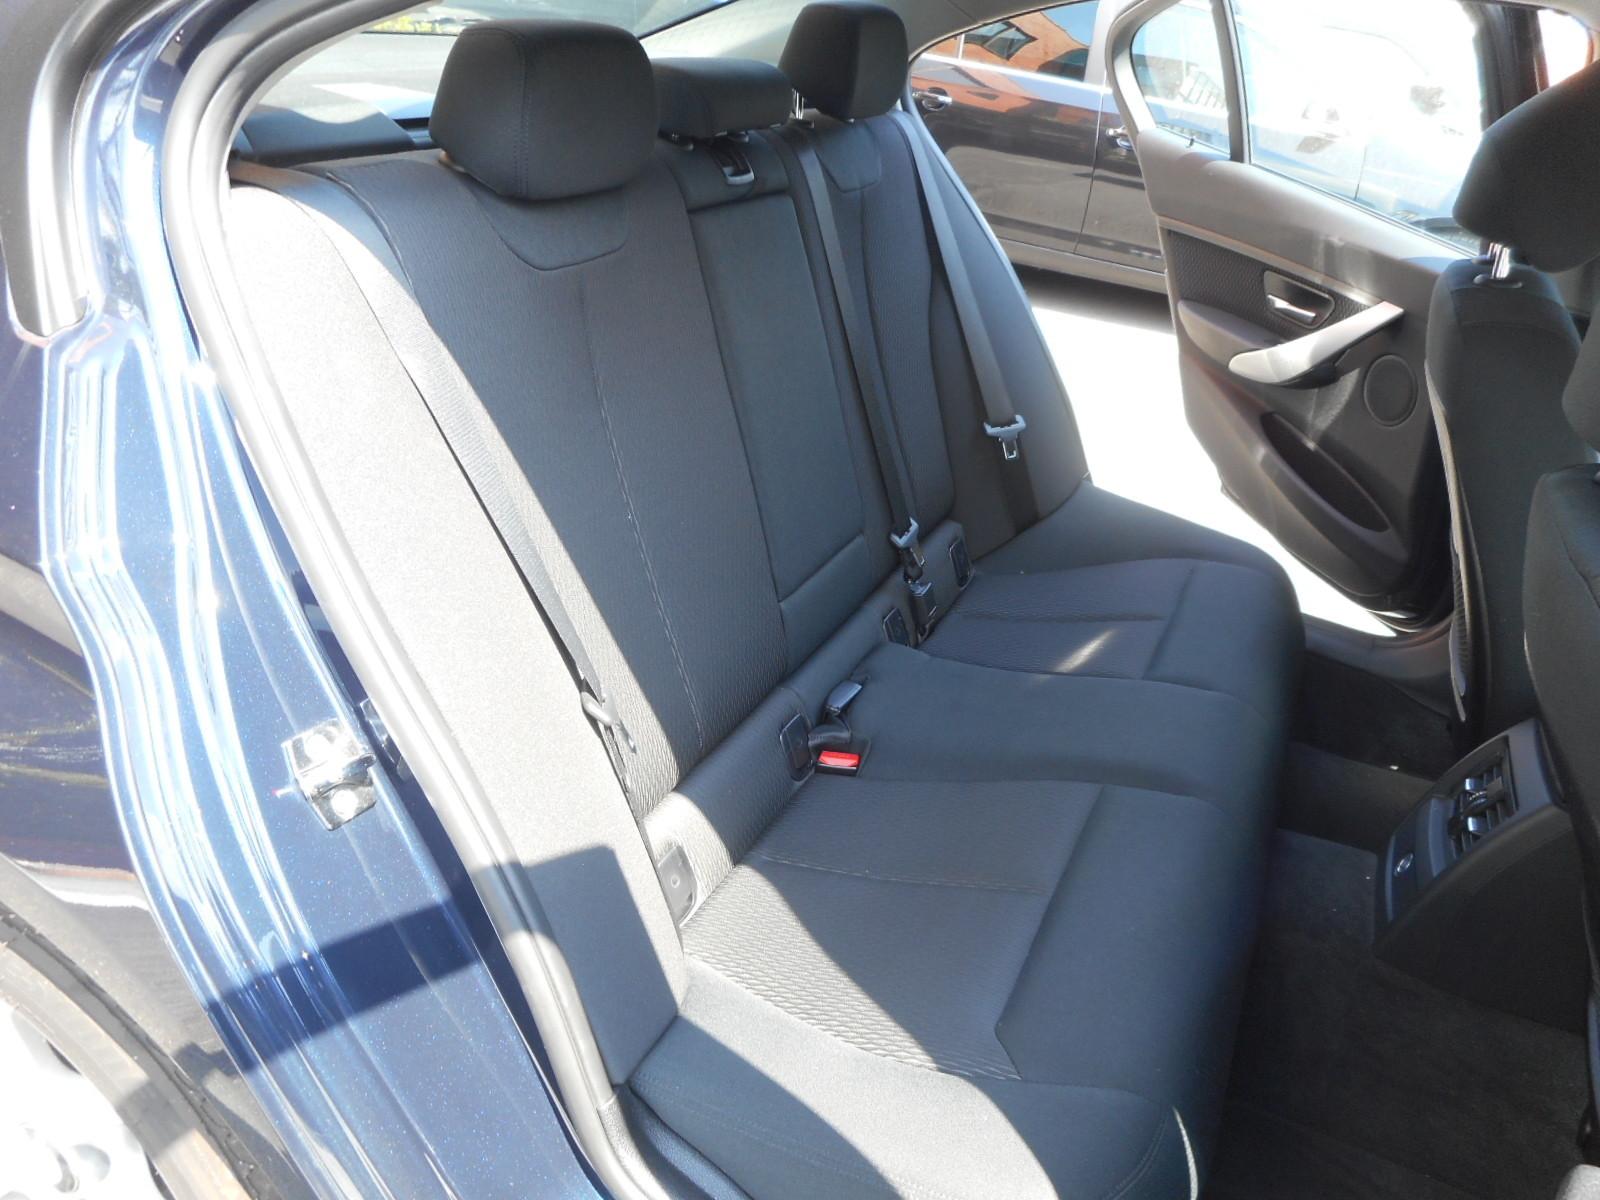 BMW 320d入りました!_c0267693_17525020.jpg